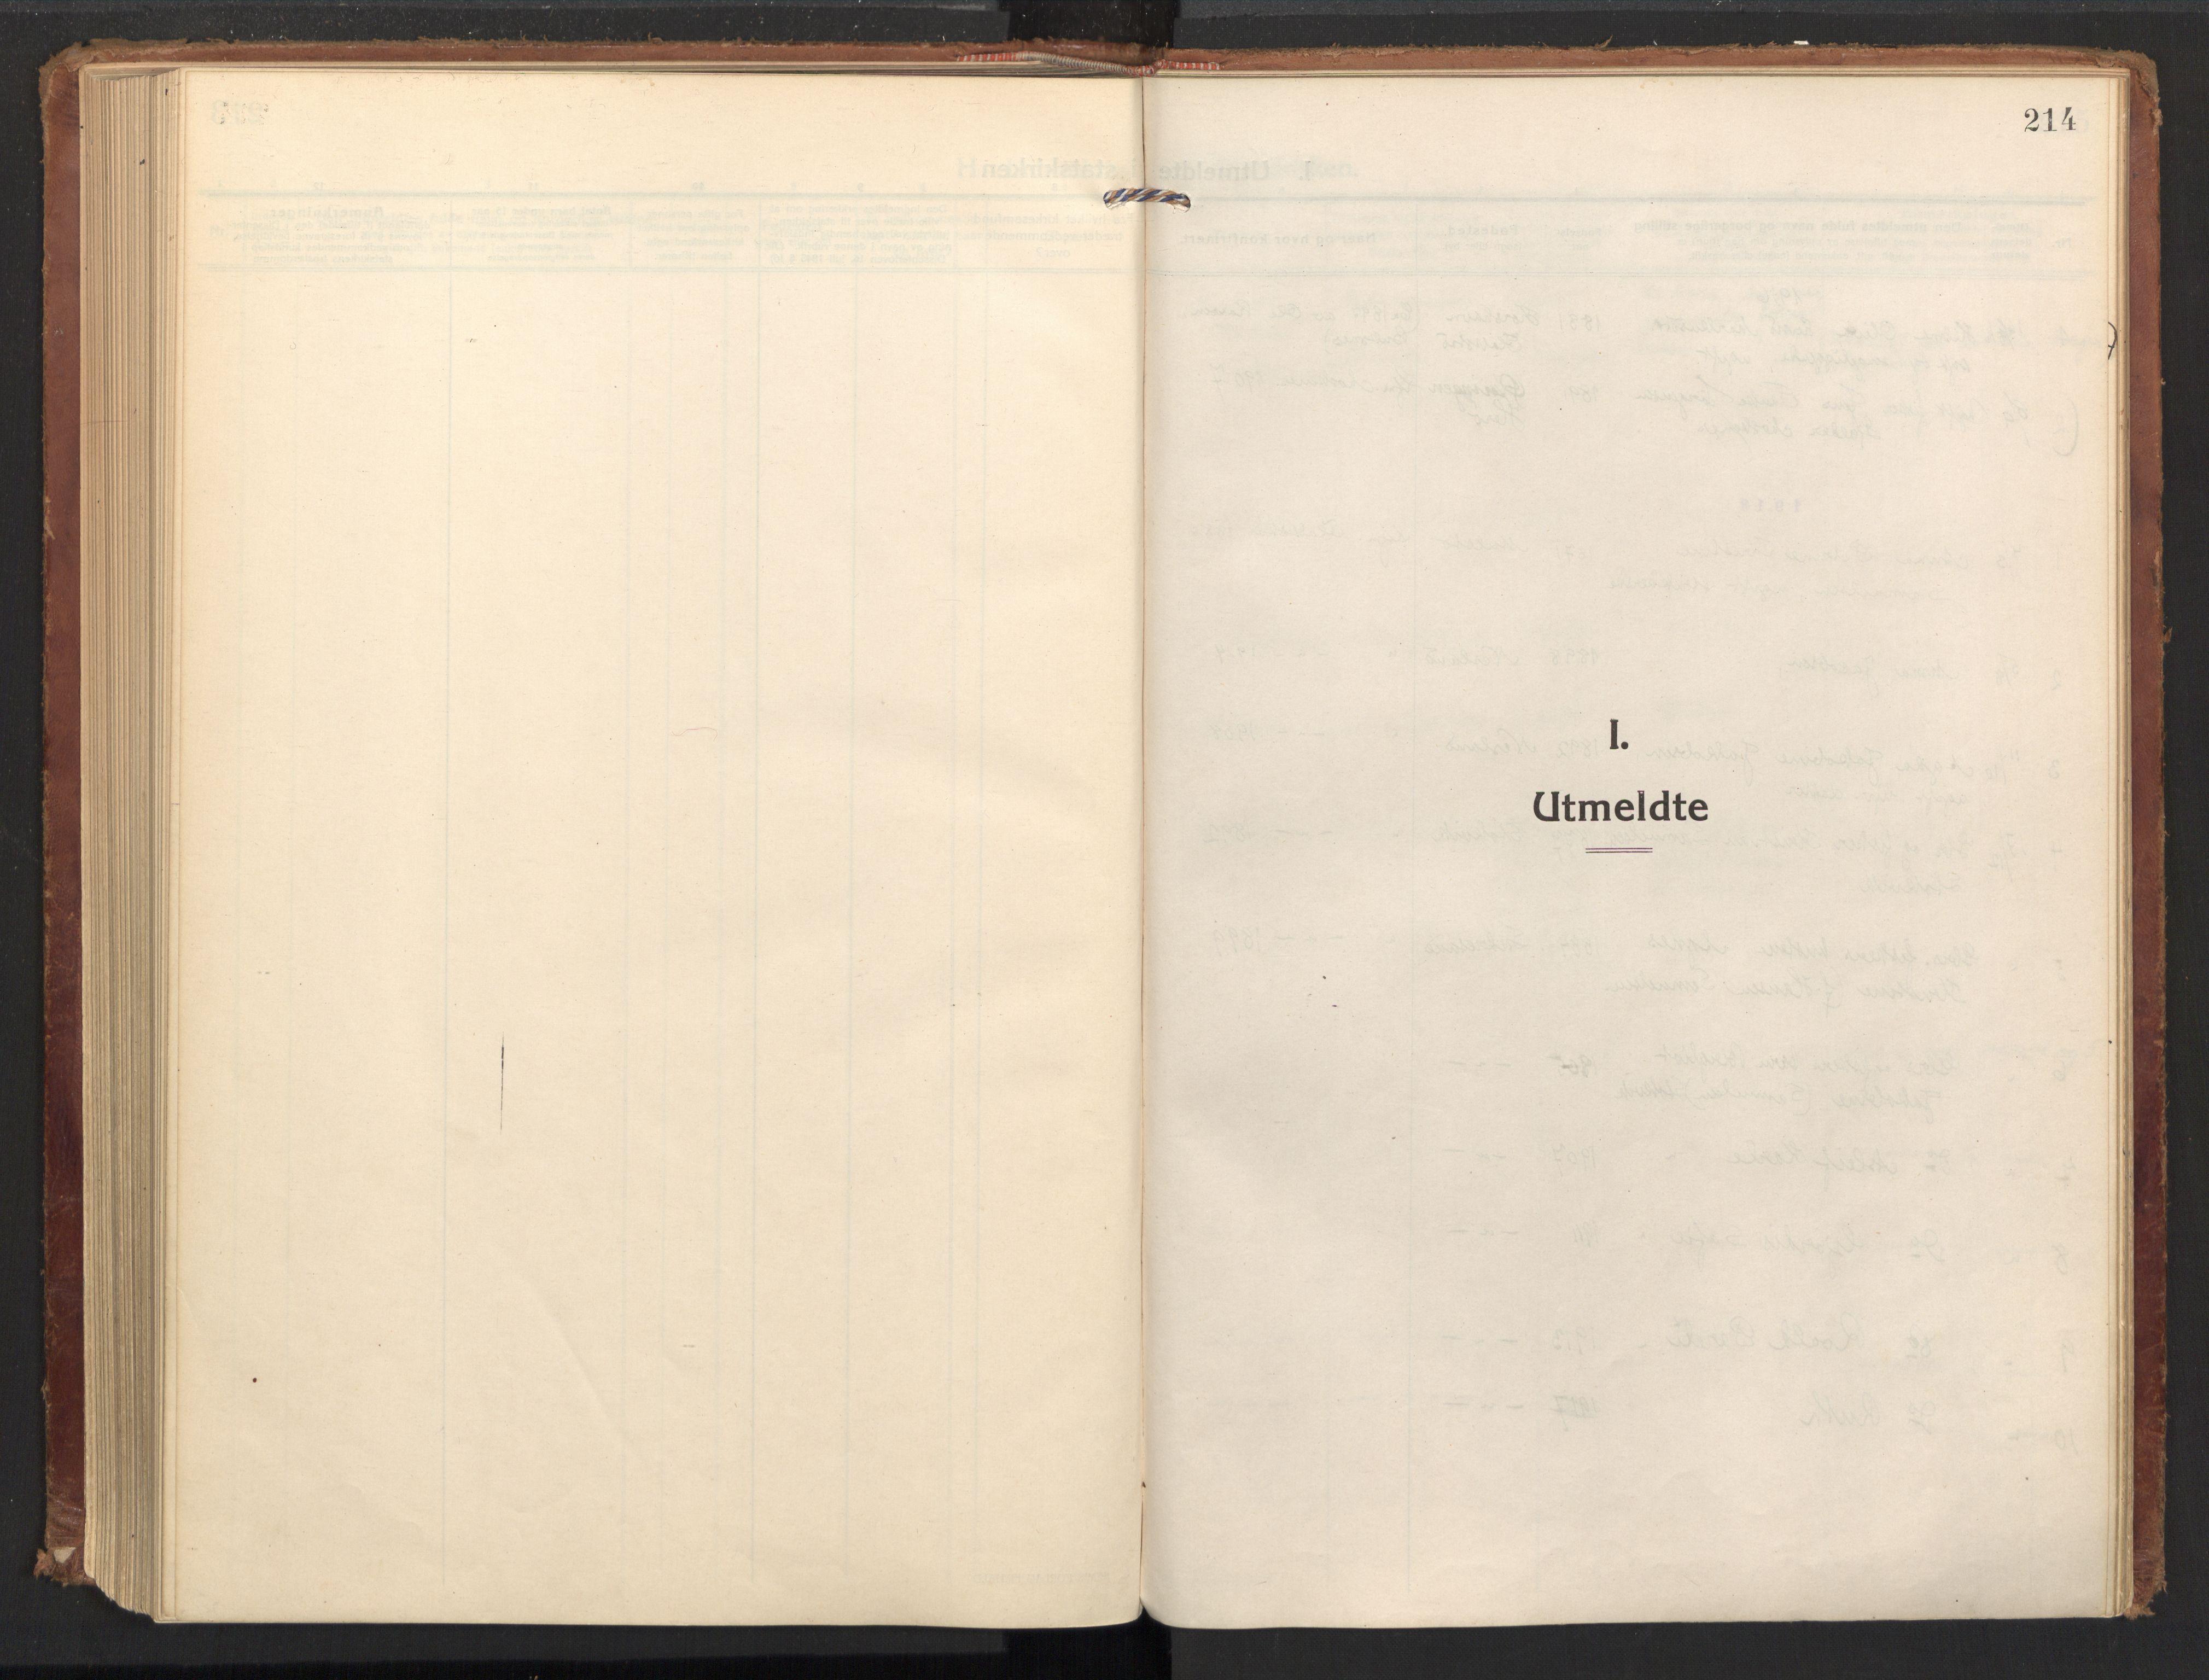 SAT, Ministerialprotokoller, klokkerbøker og fødselsregistre - Nordland, 885/L1210: Ministerialbok nr. 885A10, 1916-1926, s. 214